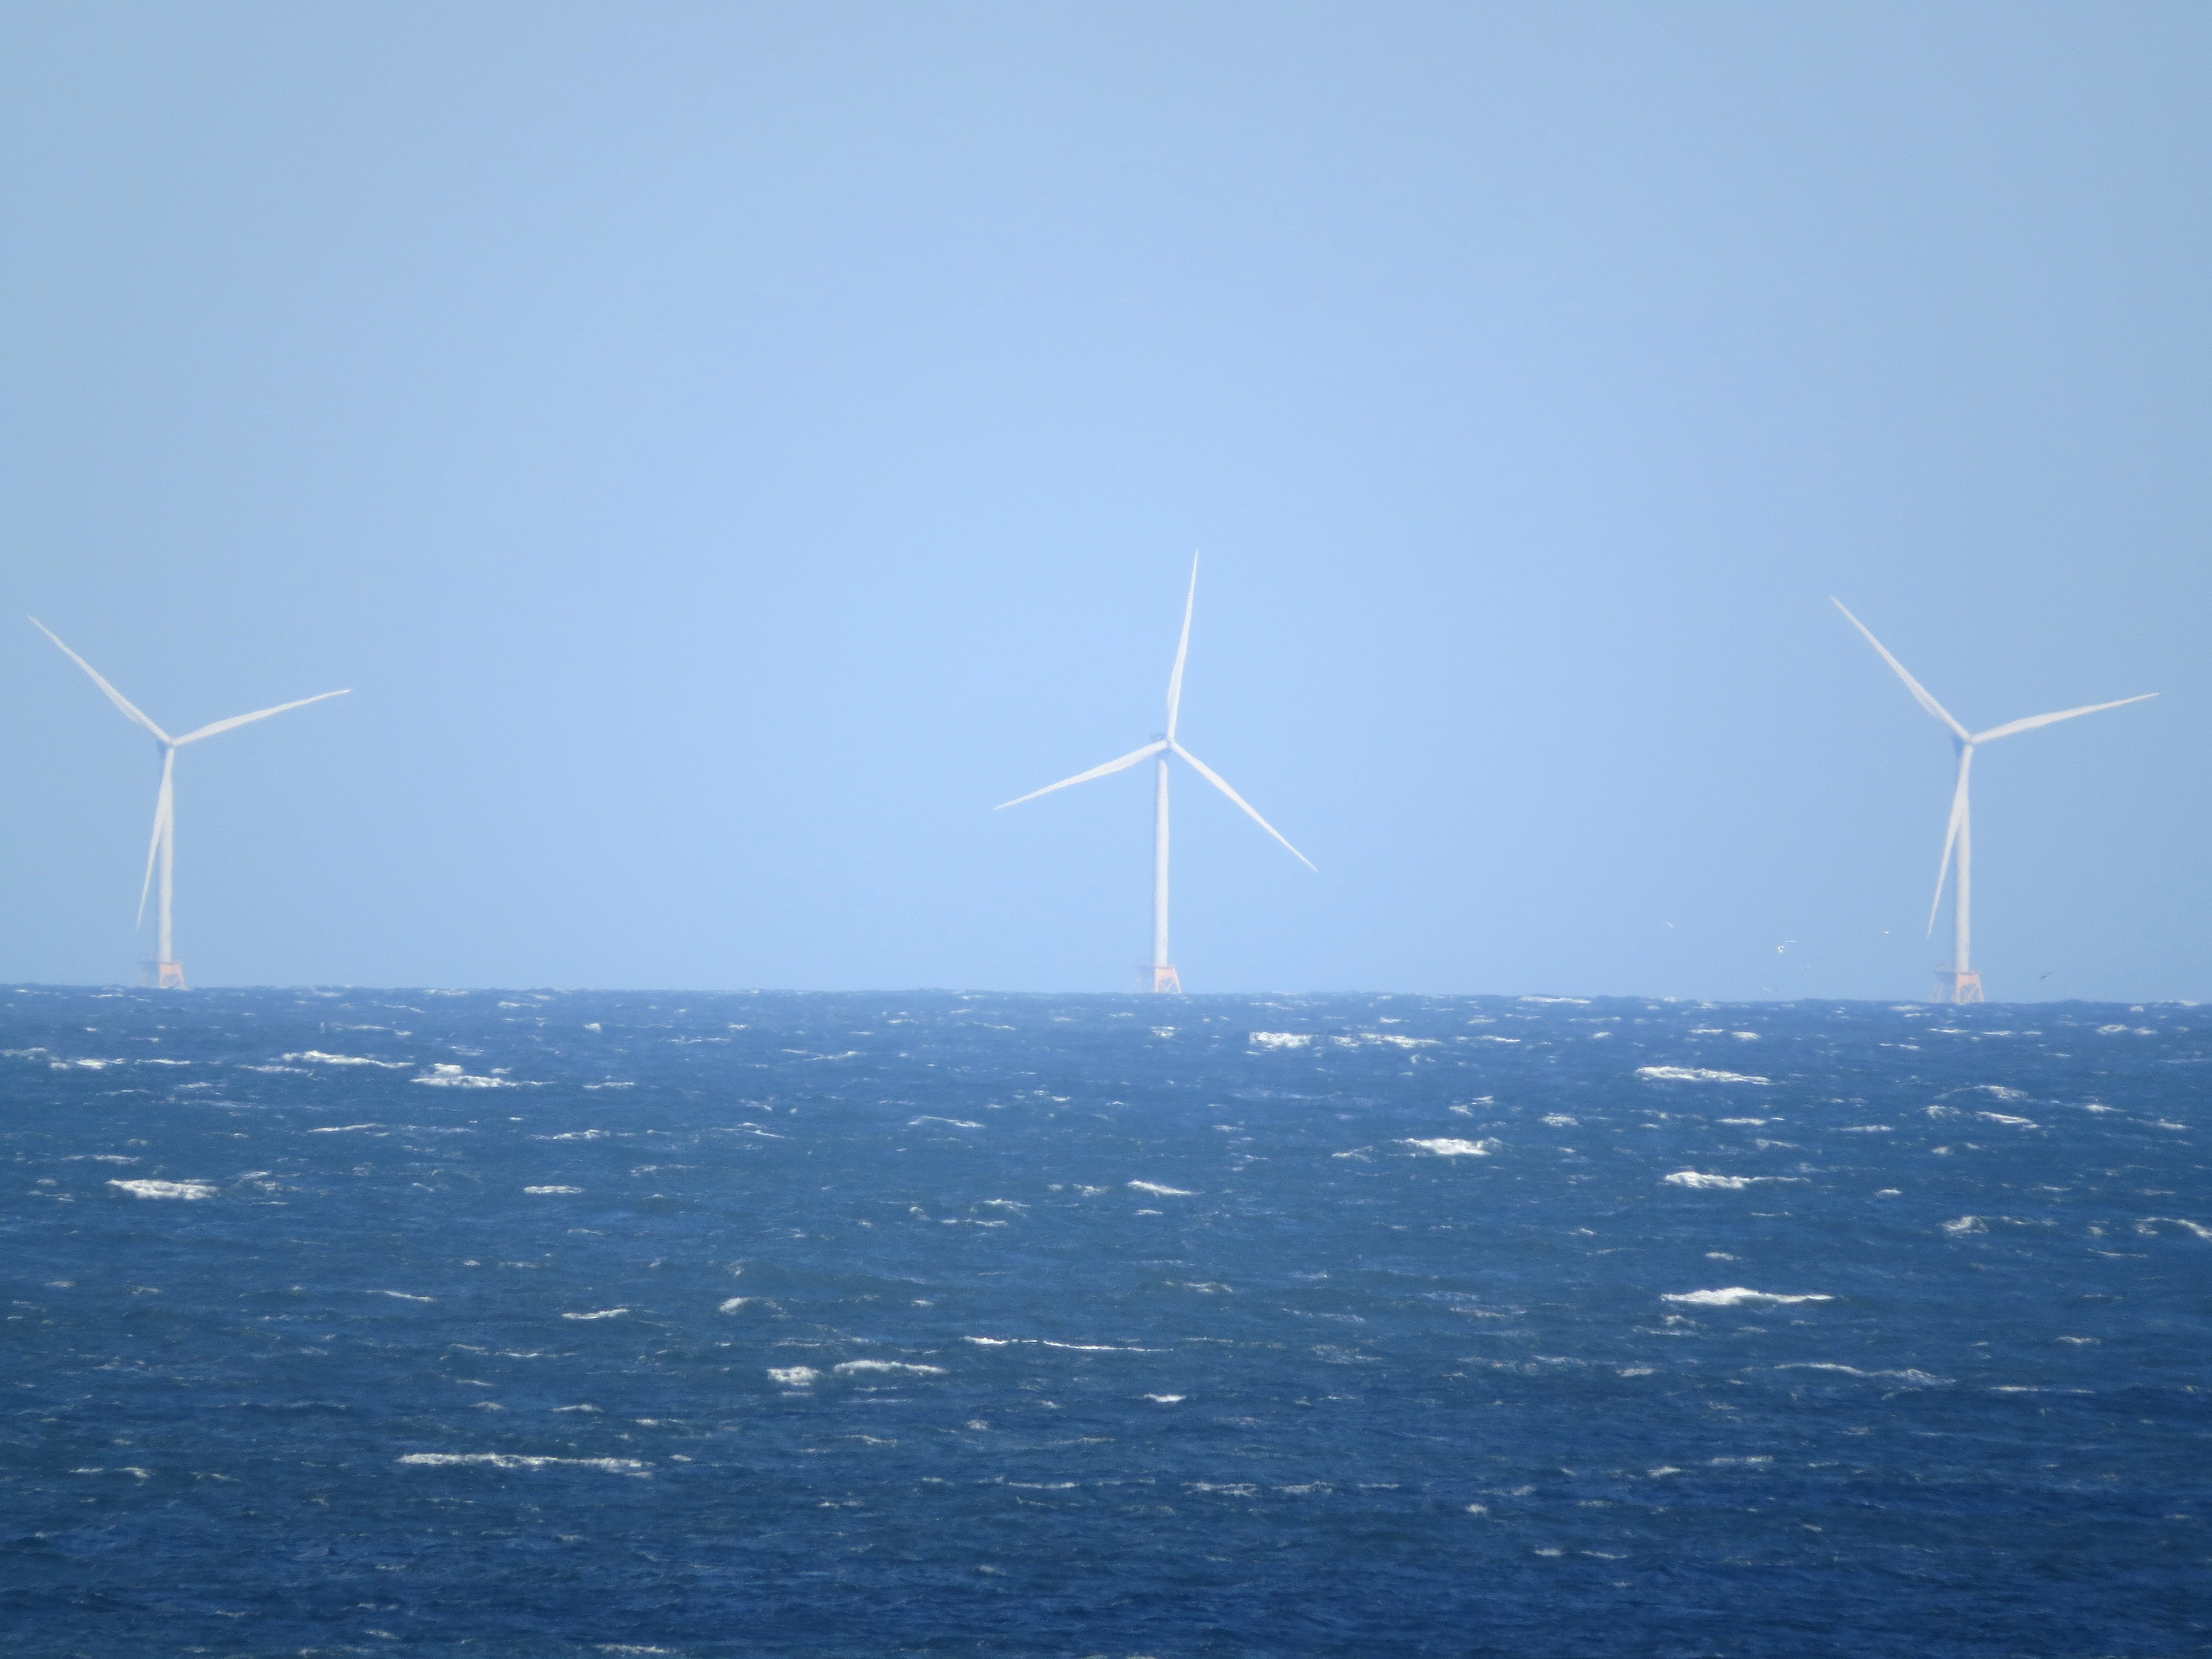 Block Island wind farm as seen from Montauk Point, New York